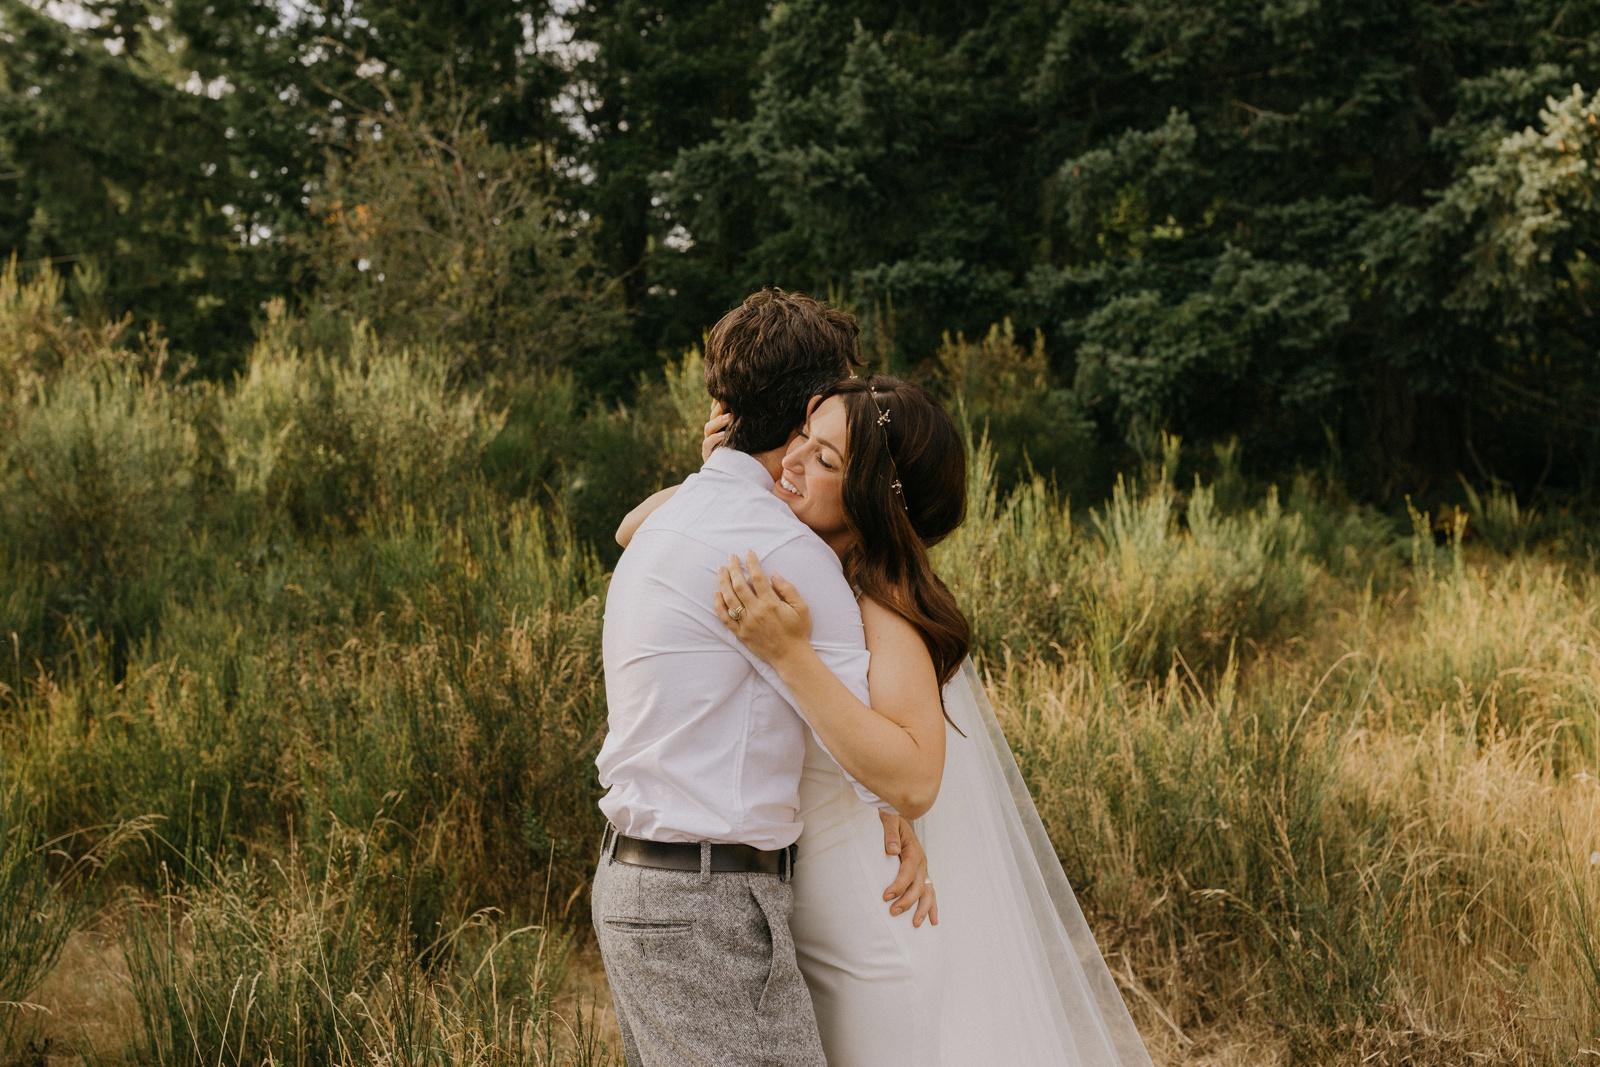 Matthew and Autumn Intimate Outdoor Backyard Wedding_0165